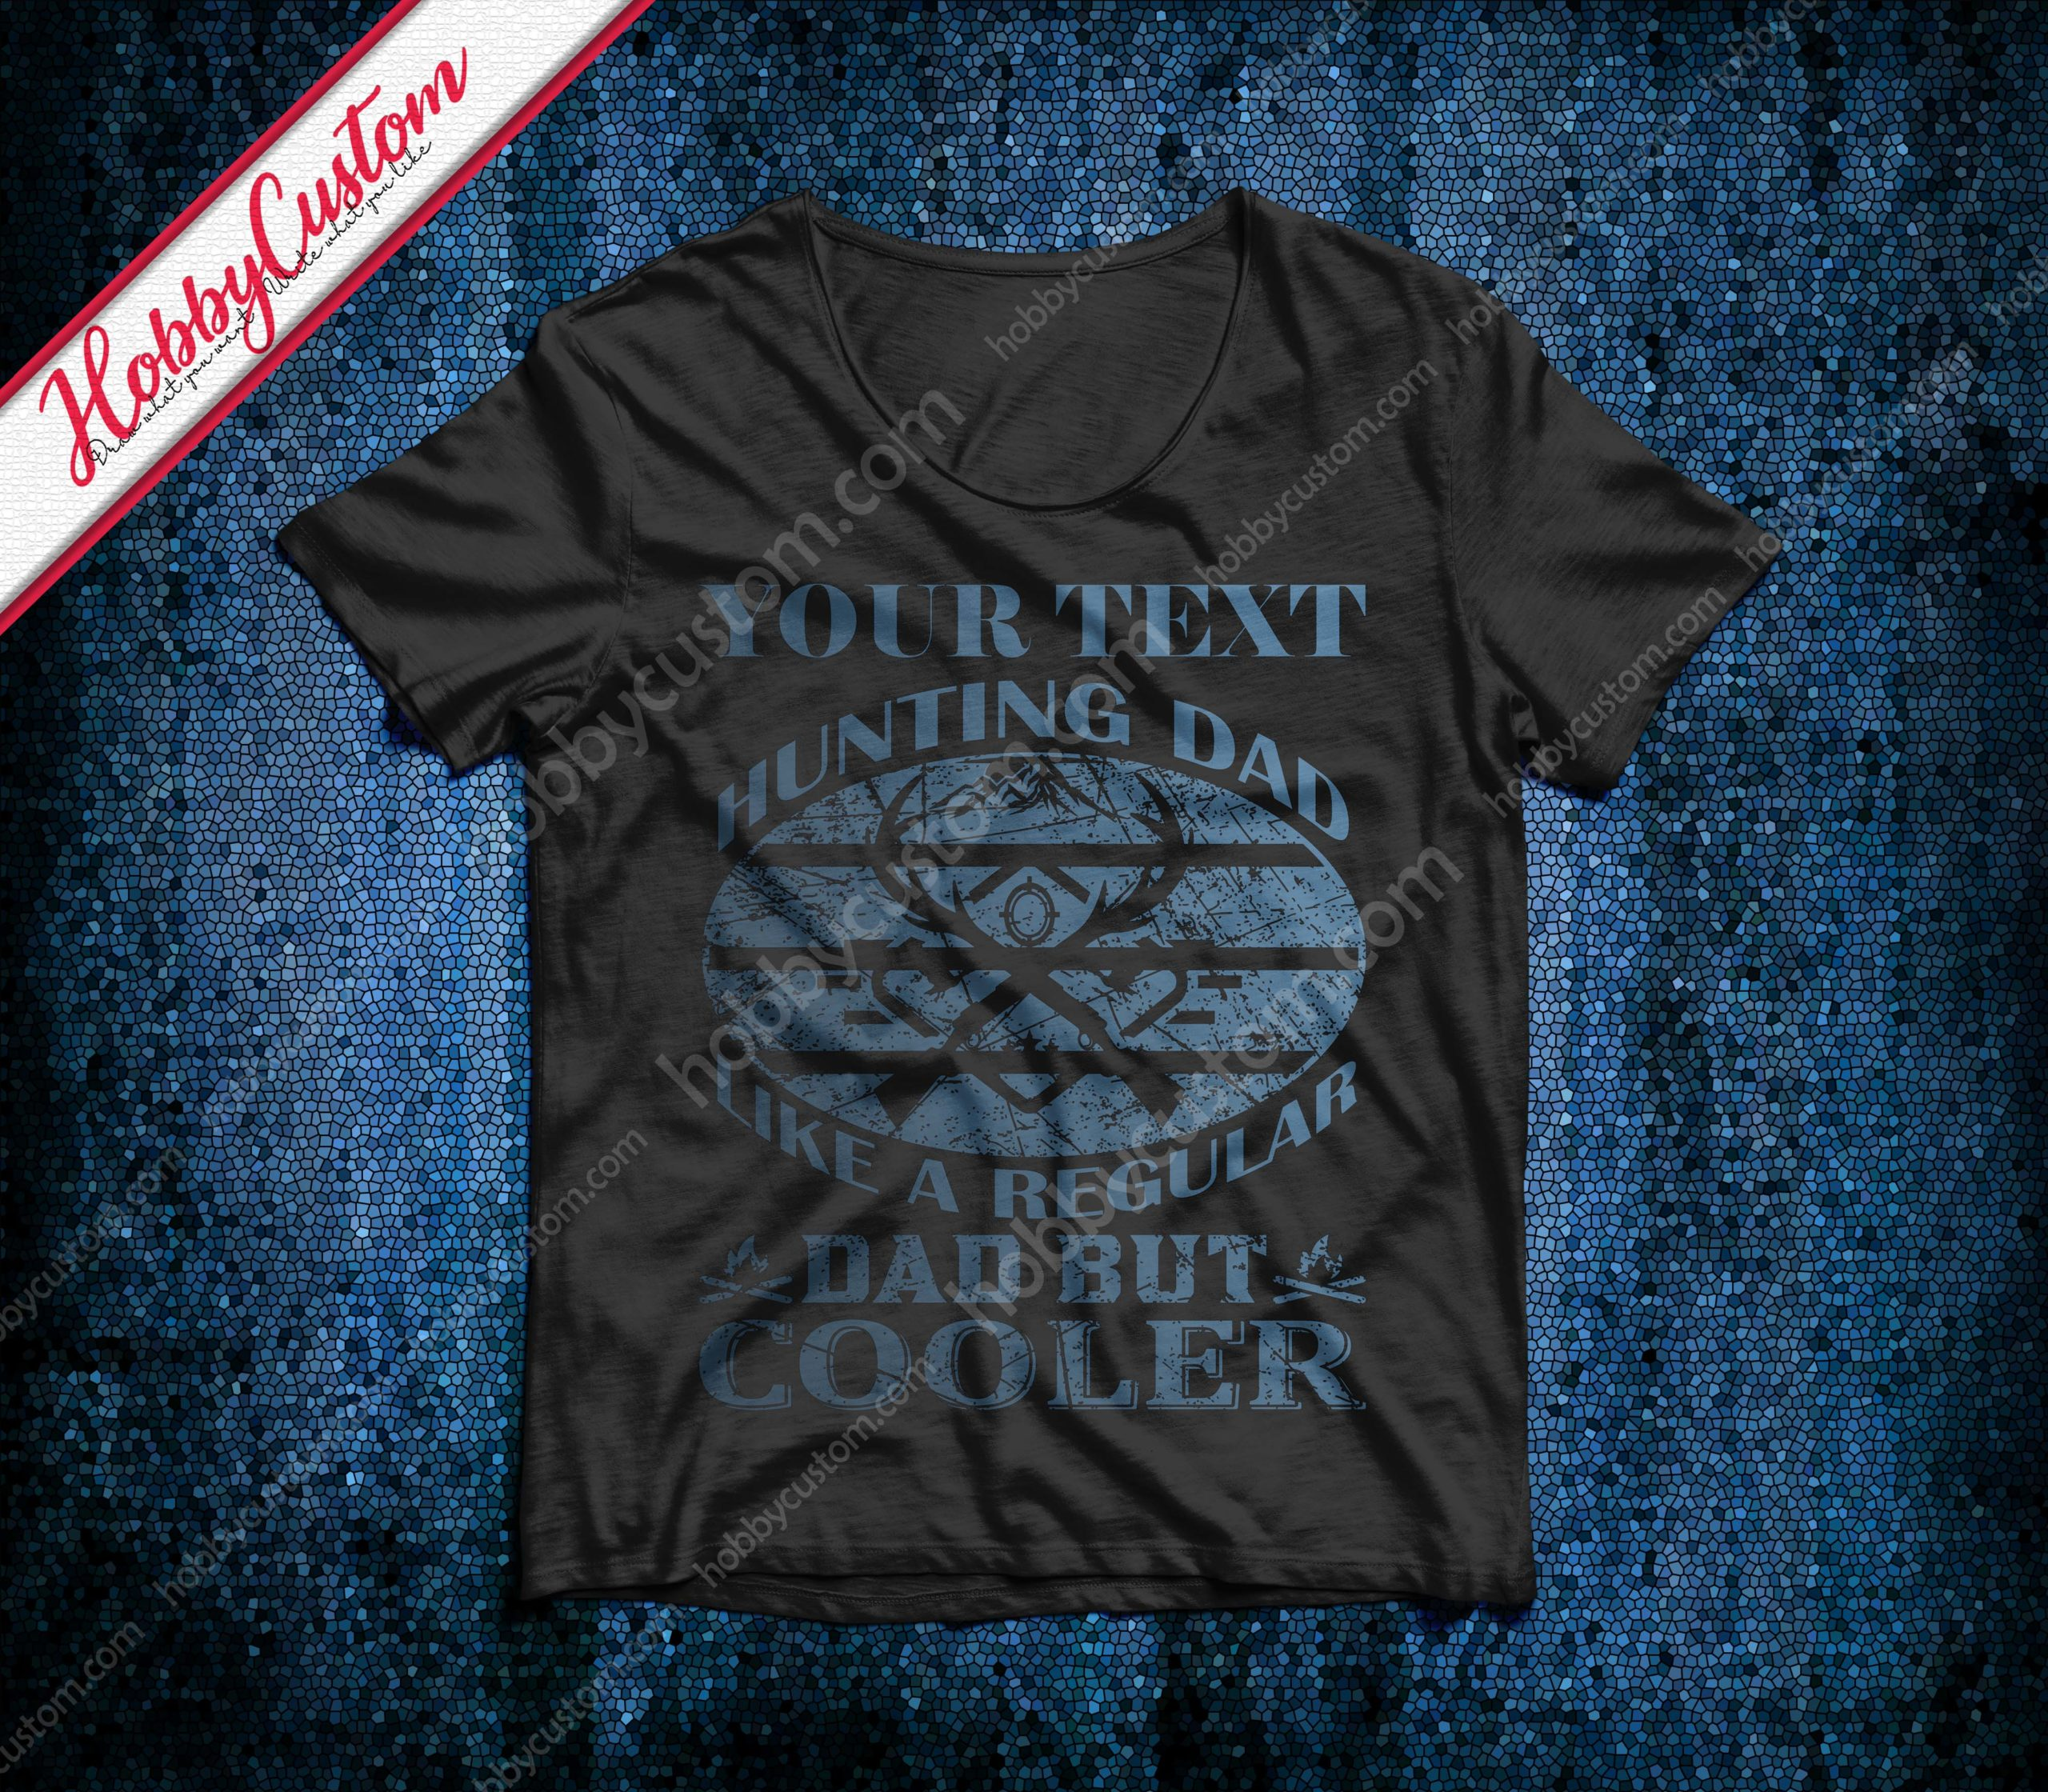 Hunting dad like a regular dad but cooler customize t-shirt